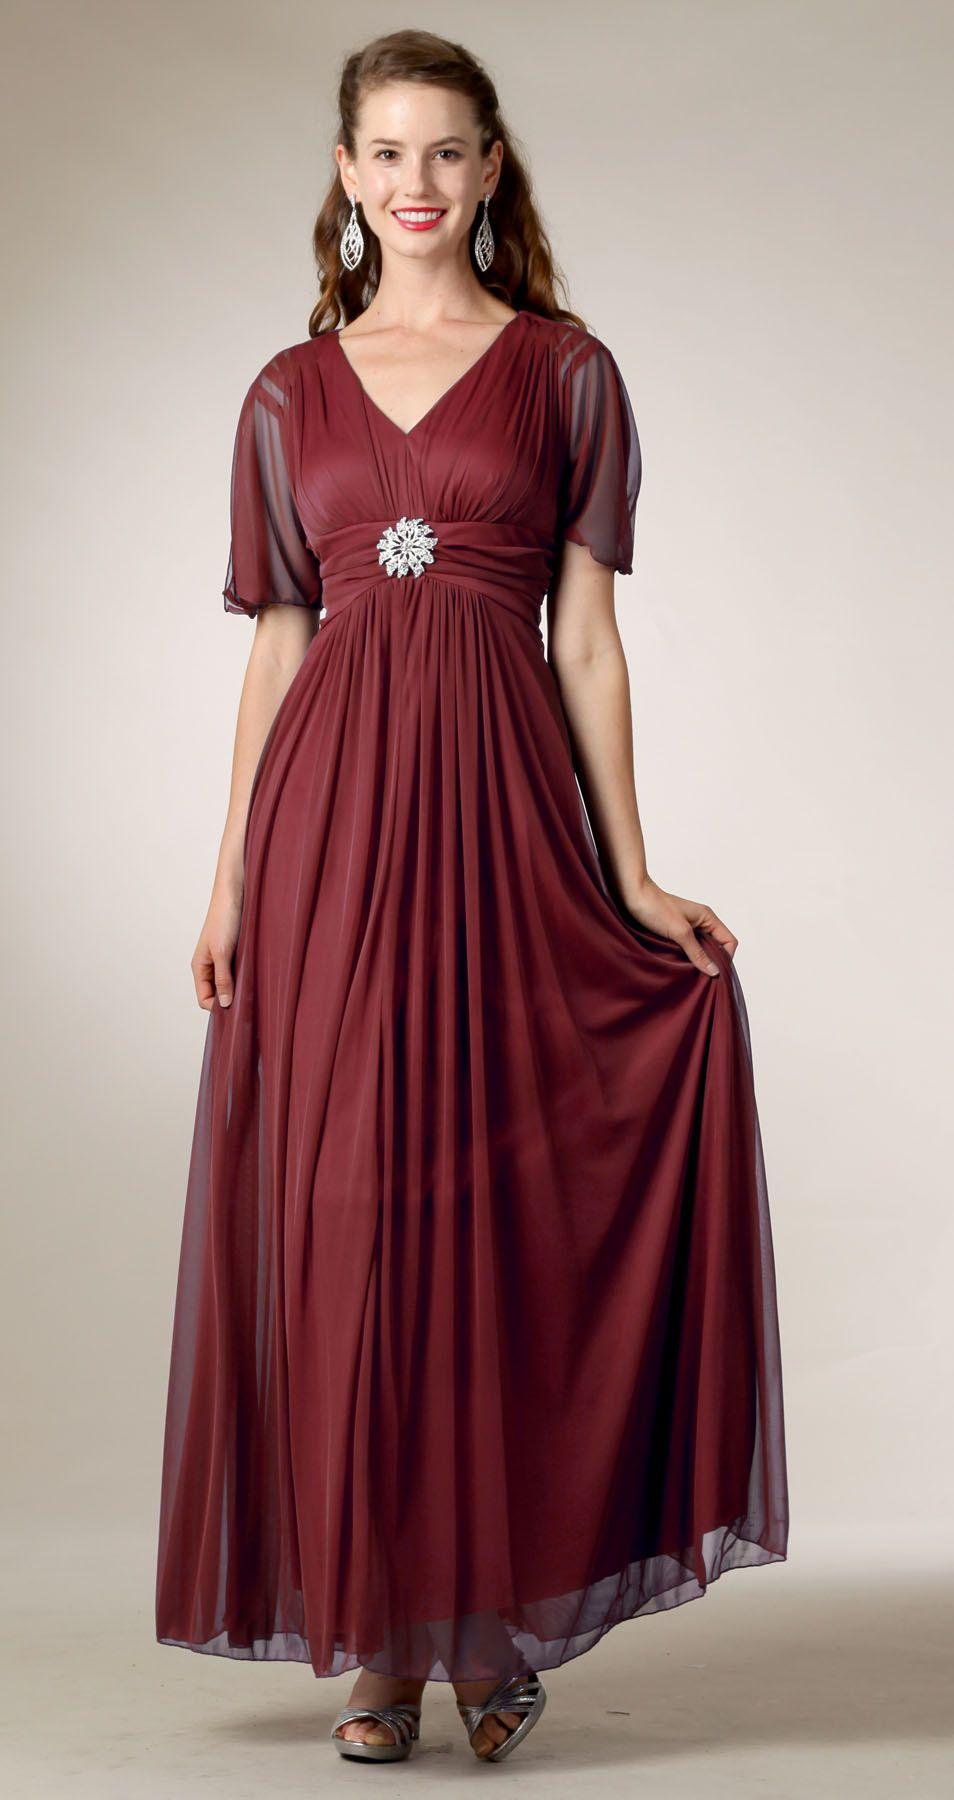 Modest Burgundy Gown Flowy Tea Length Empire V Neck Short